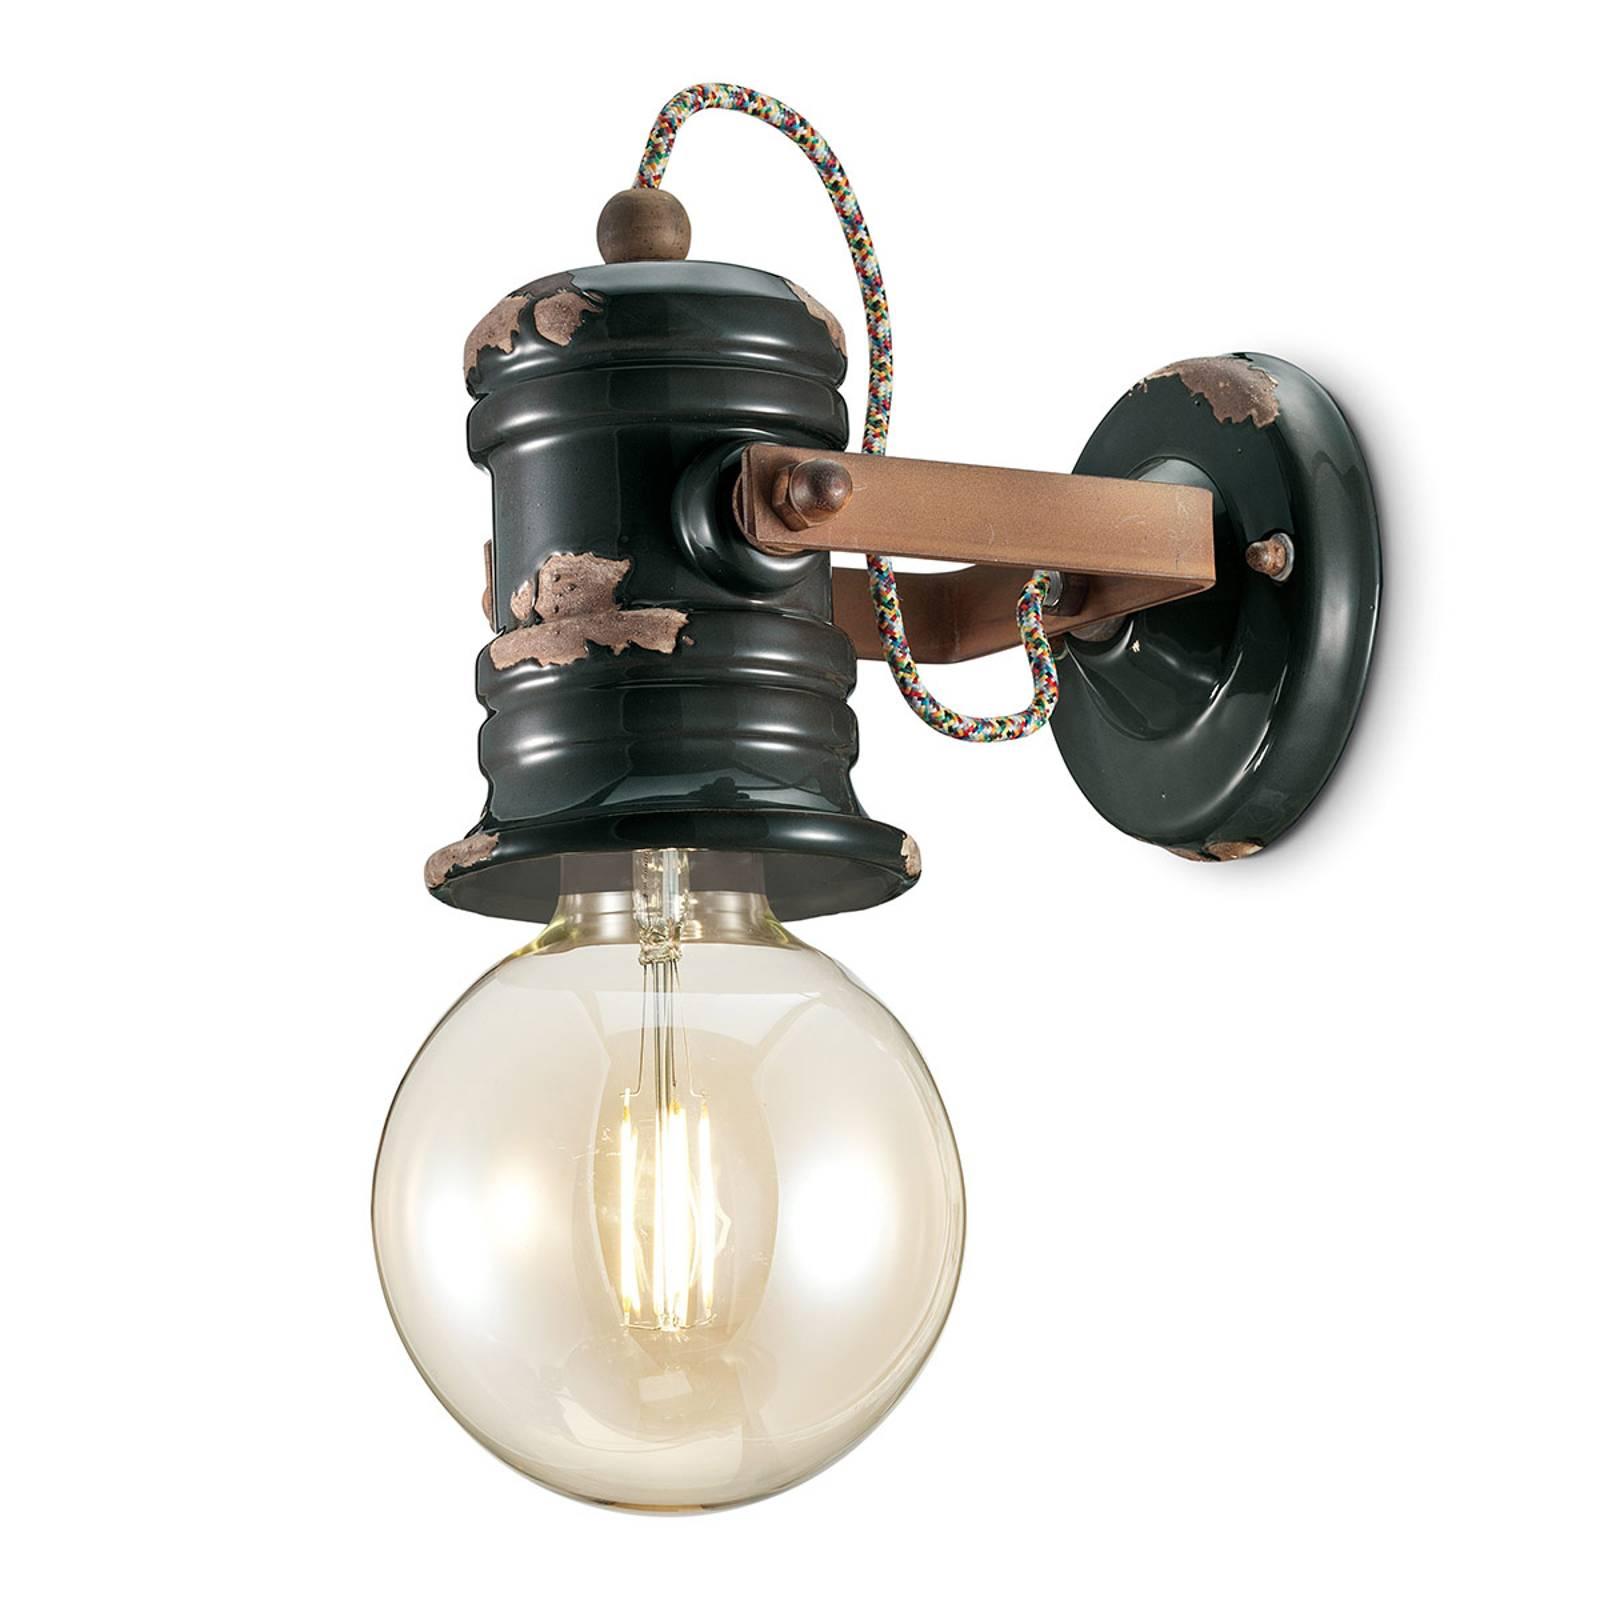 Wandlamp C1843 in vintage design zwart